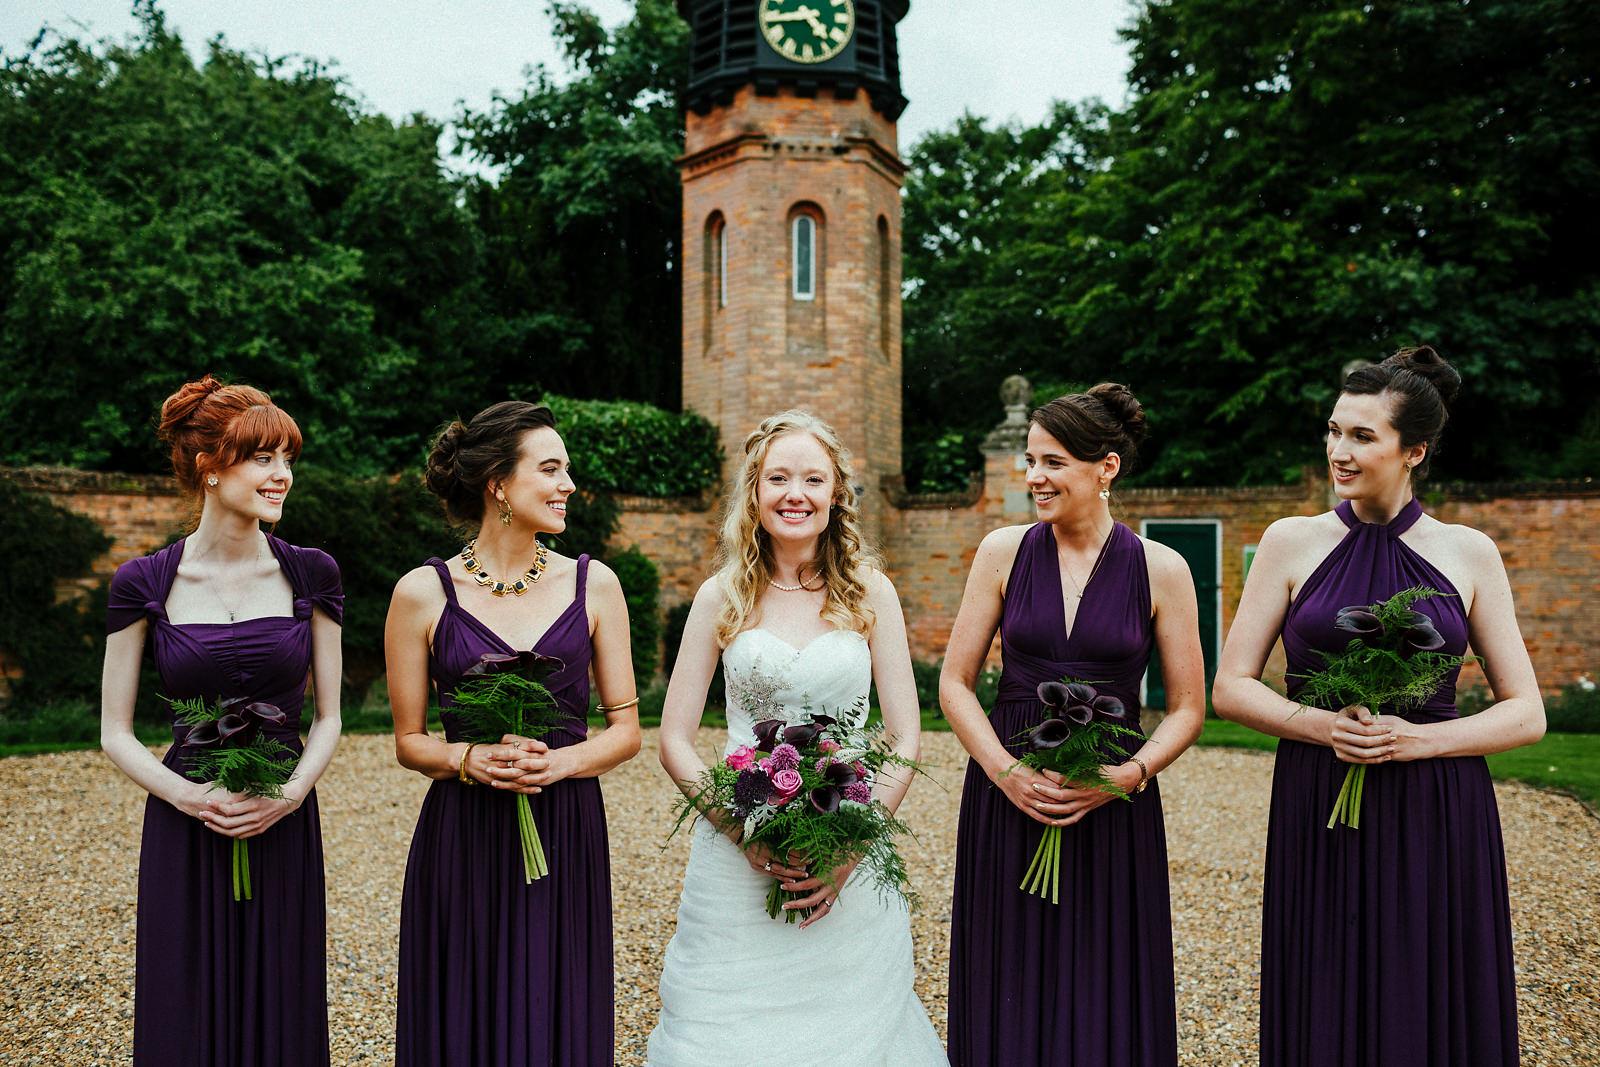 Tudor barn bridal party group photo idea